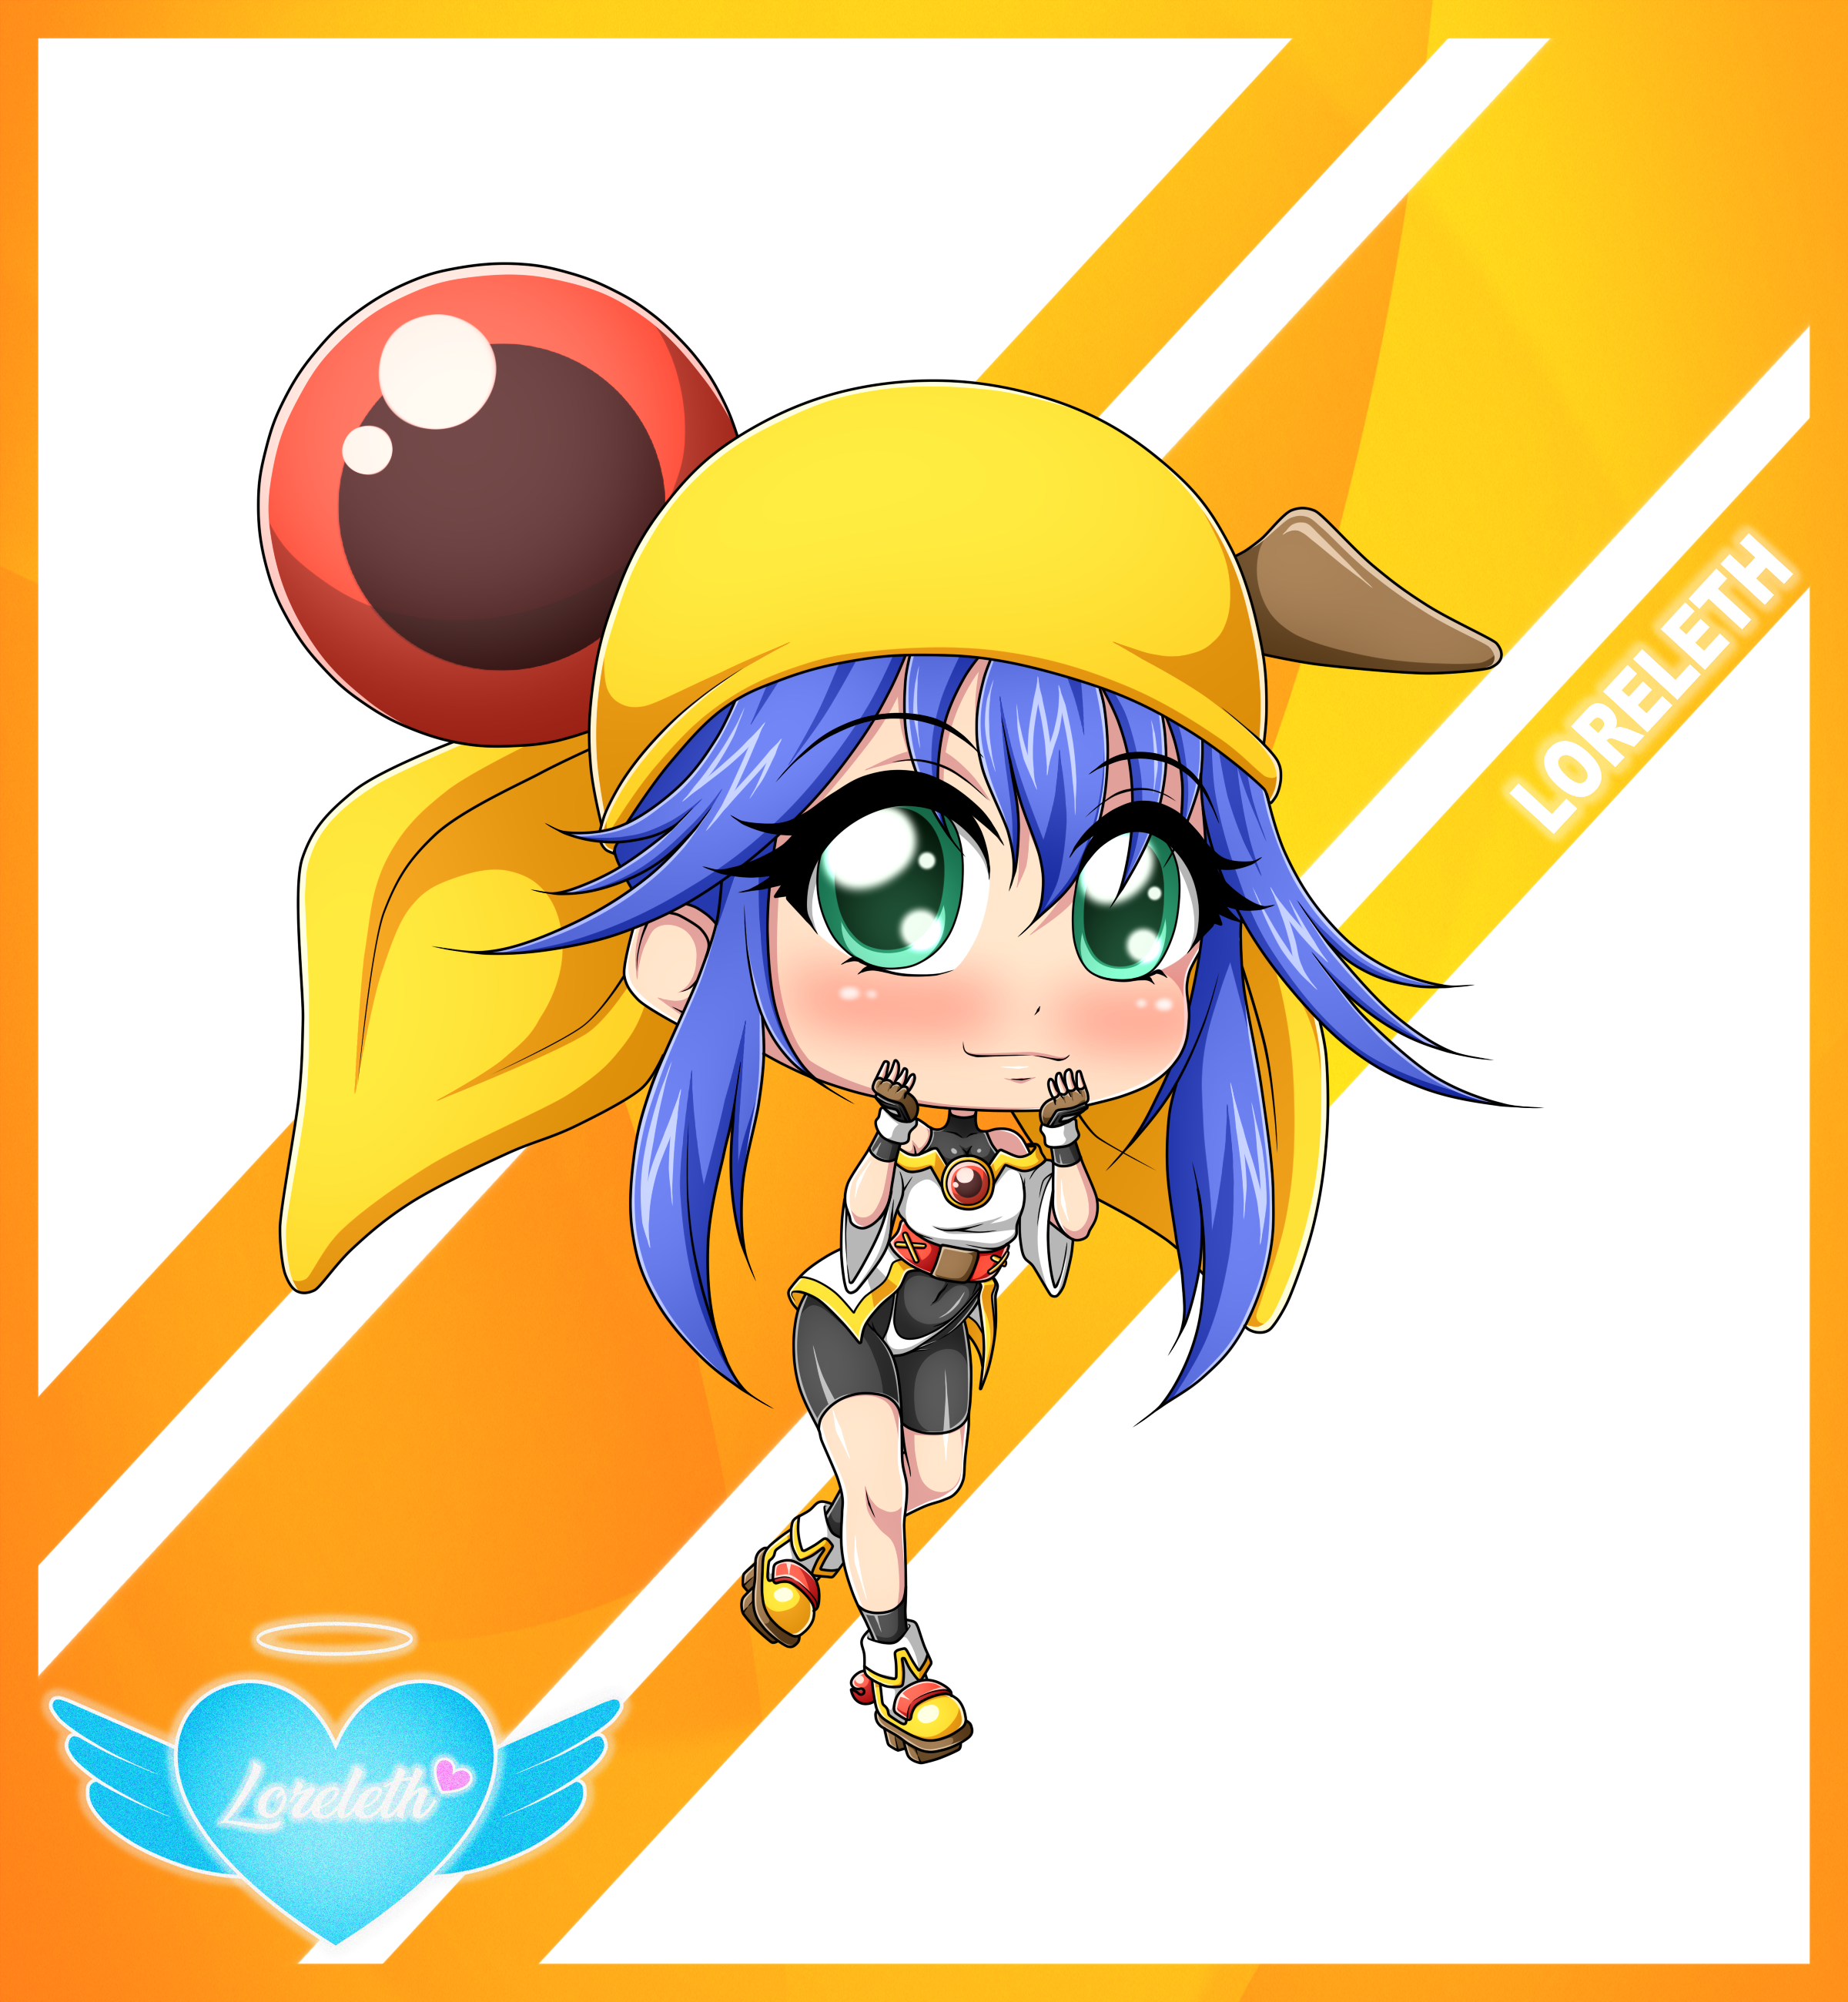 Cute Chibi Girl 53 (Commission)